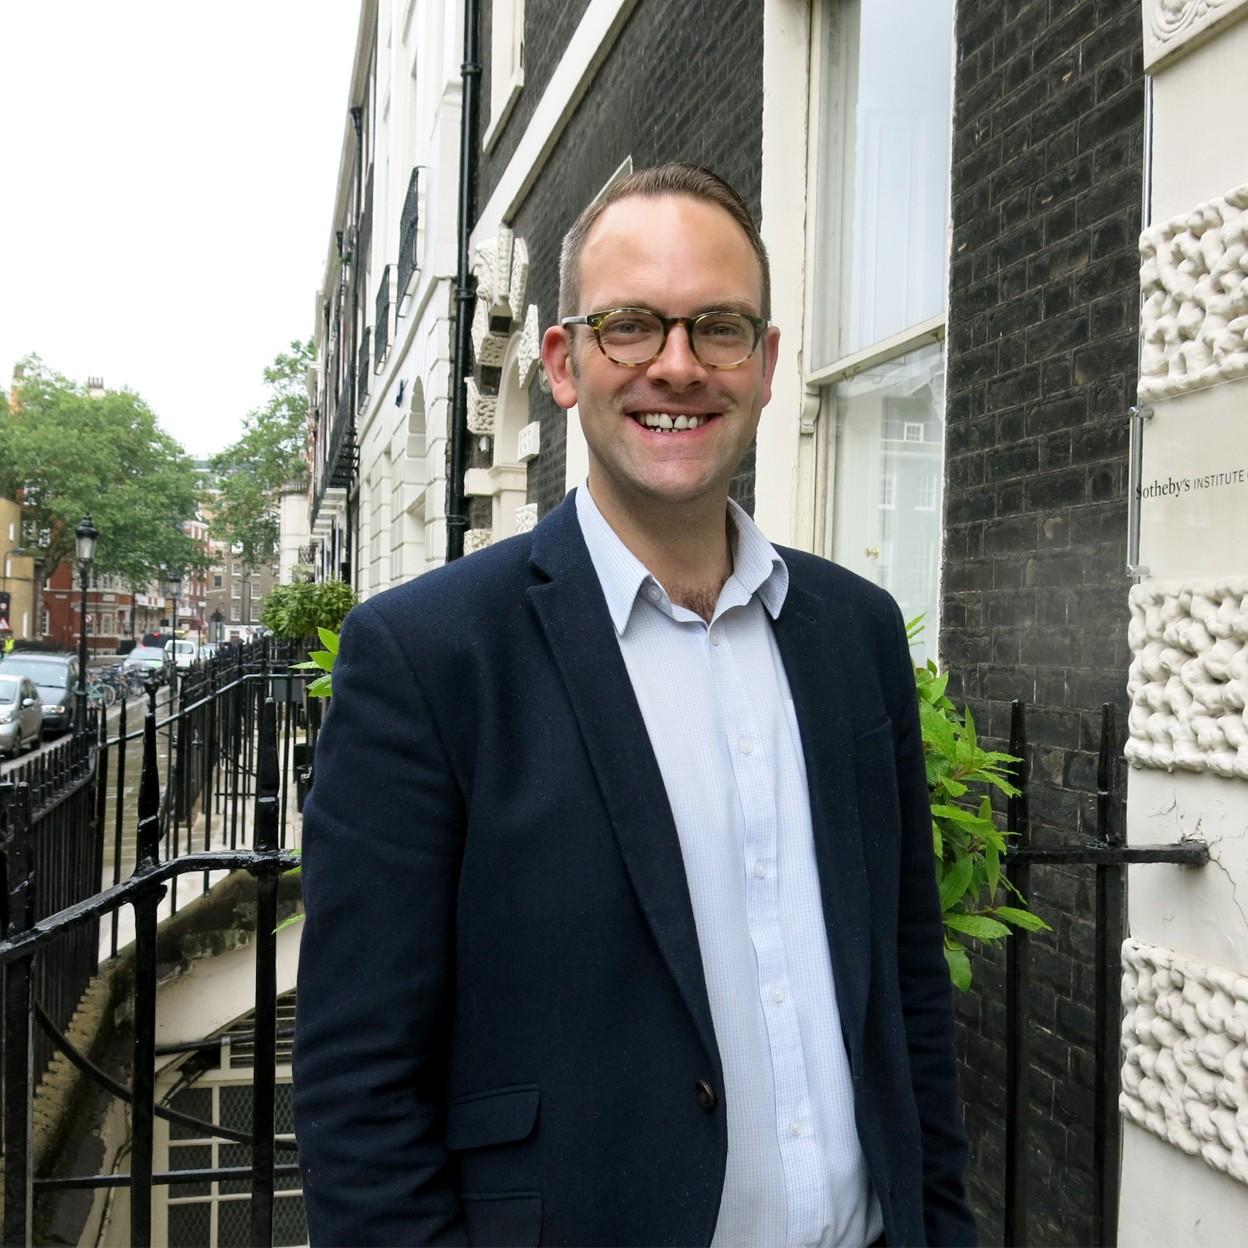 Gareth Fletcher